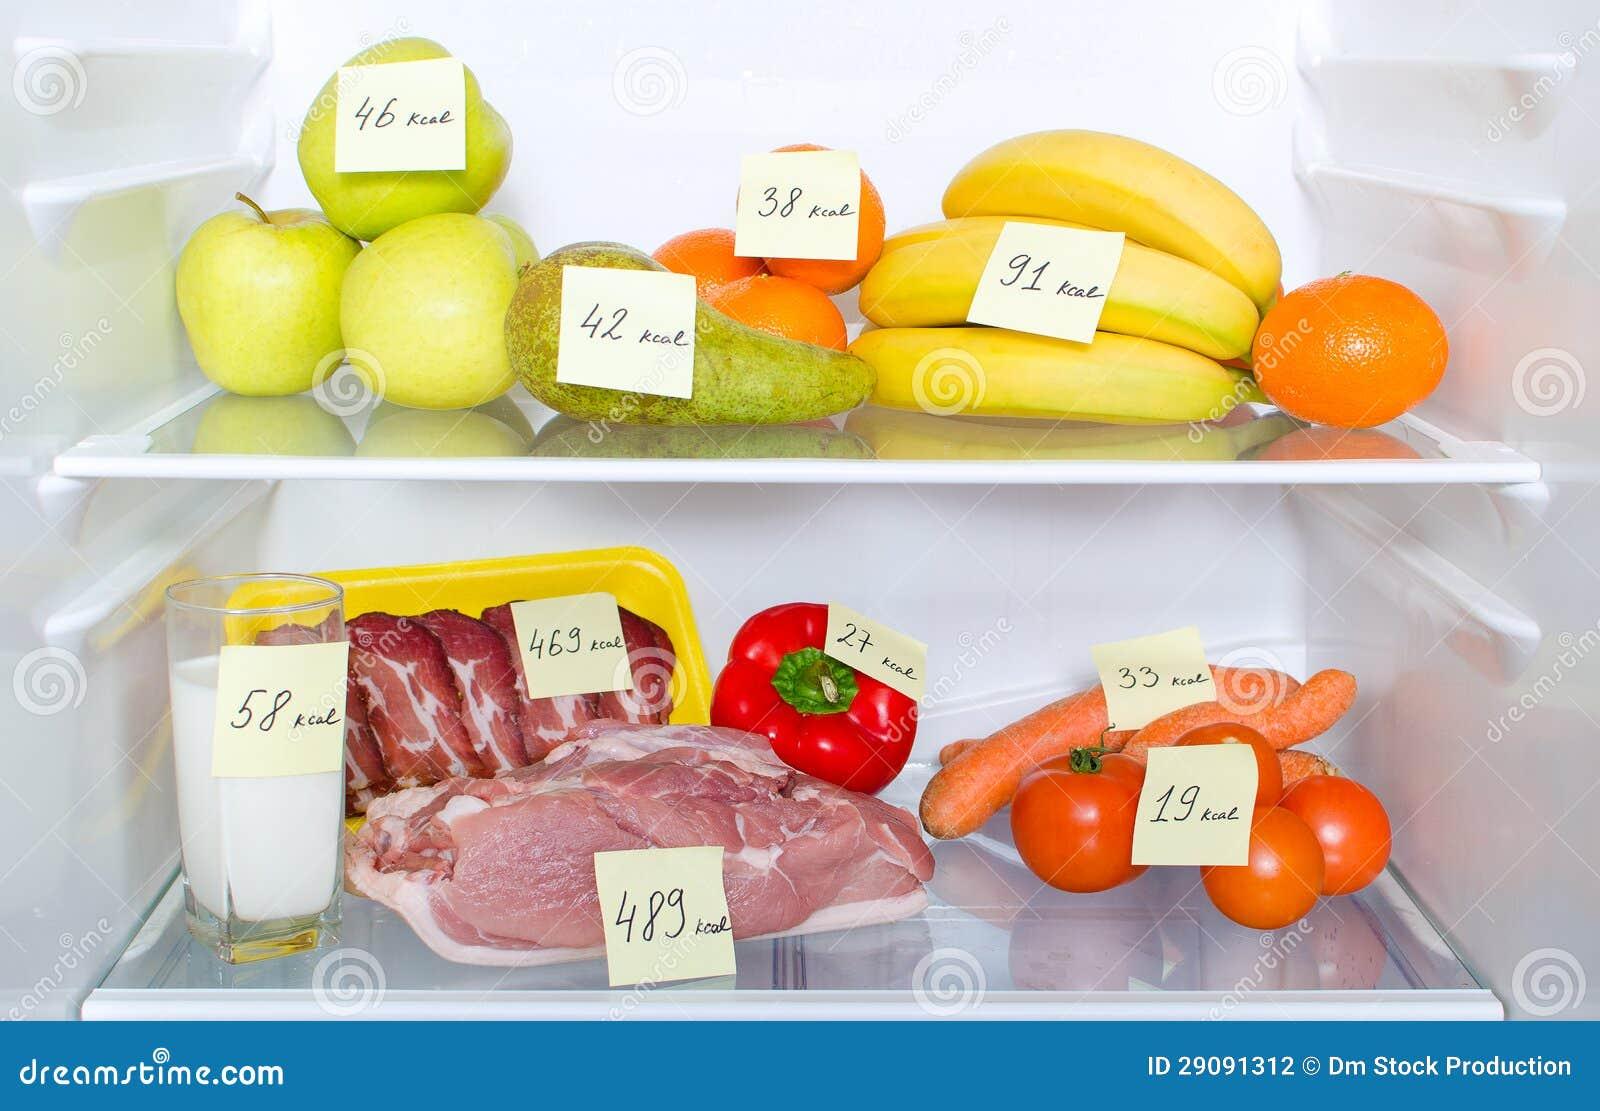 Open Fridge Full Of Fruits Vegetables And Meat Stock